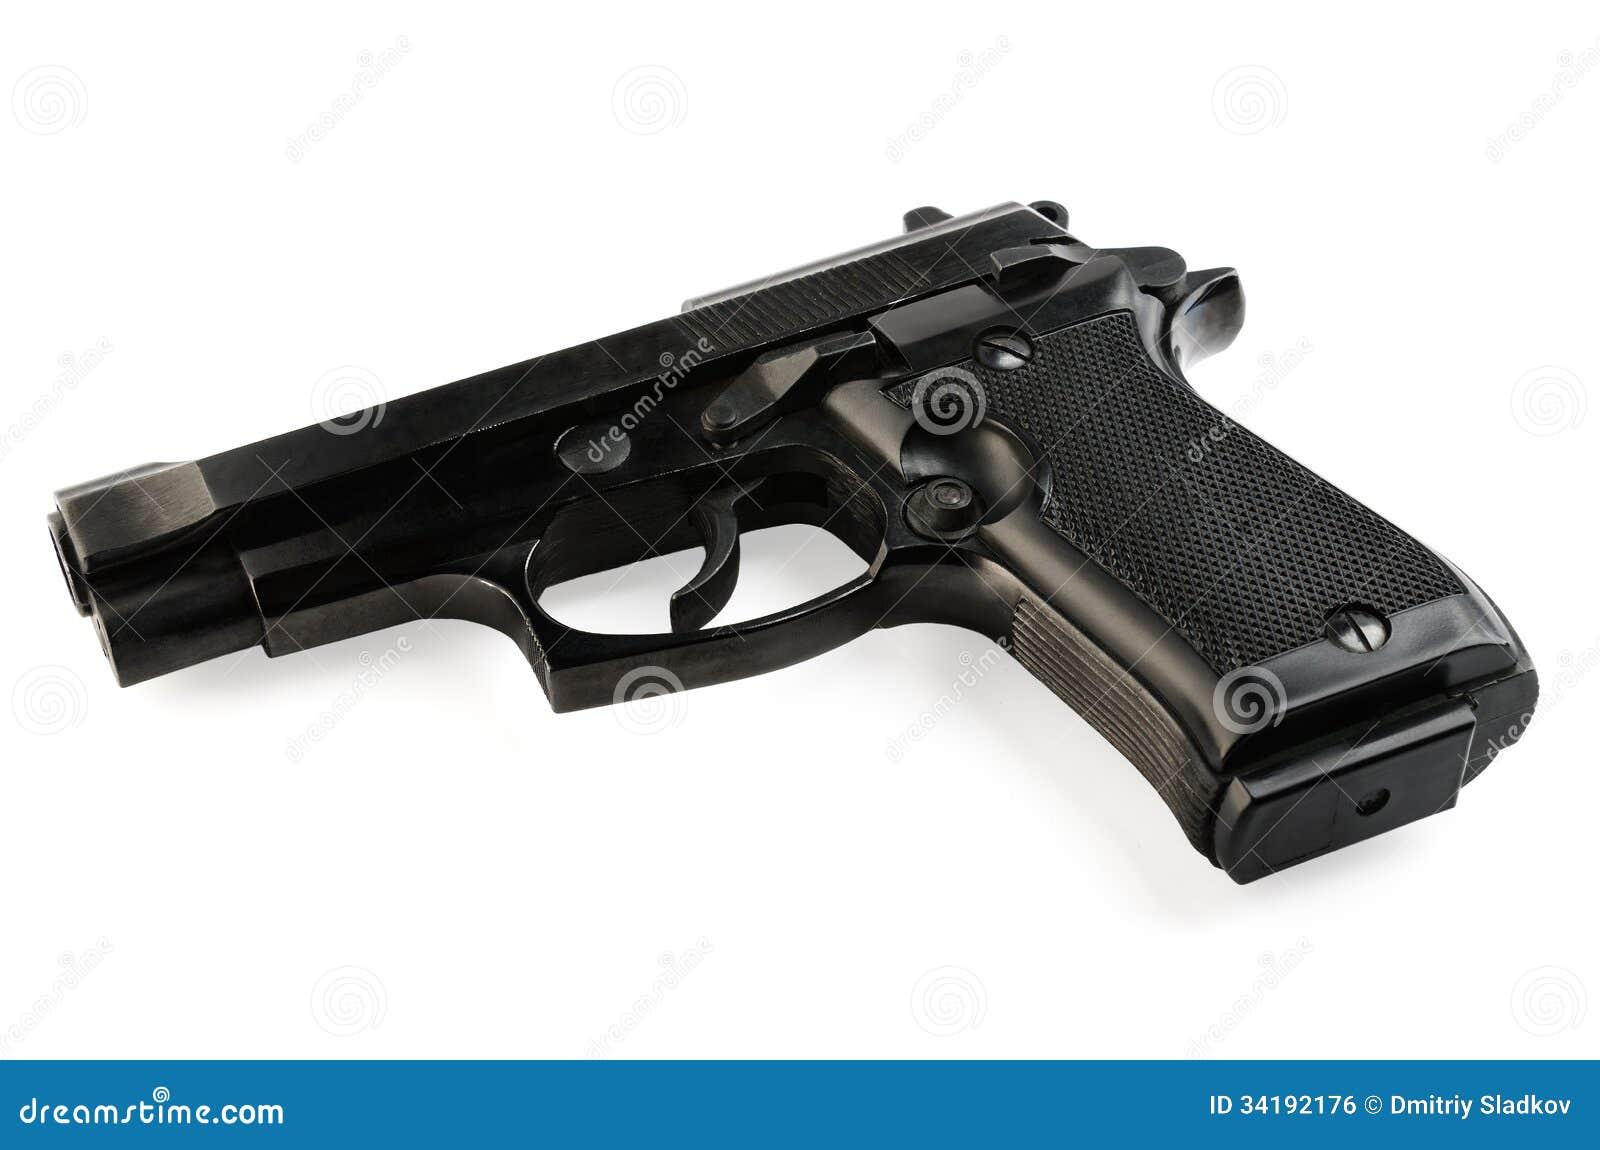 gun white background - photo #14